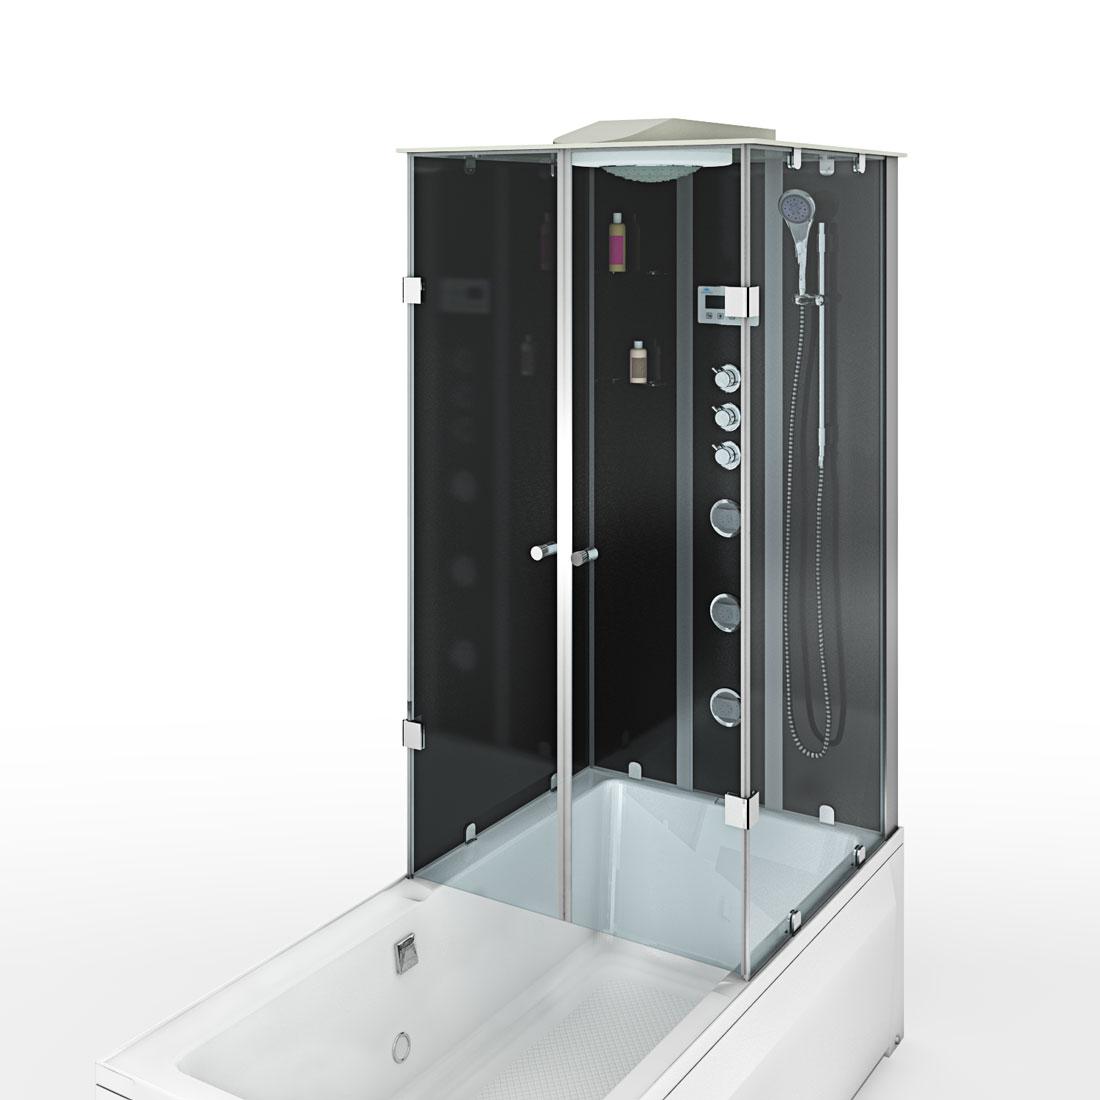 acquavapore dtp50 a305l dusch wannen kombi in 180x90cm trendbad24. Black Bedroom Furniture Sets. Home Design Ideas